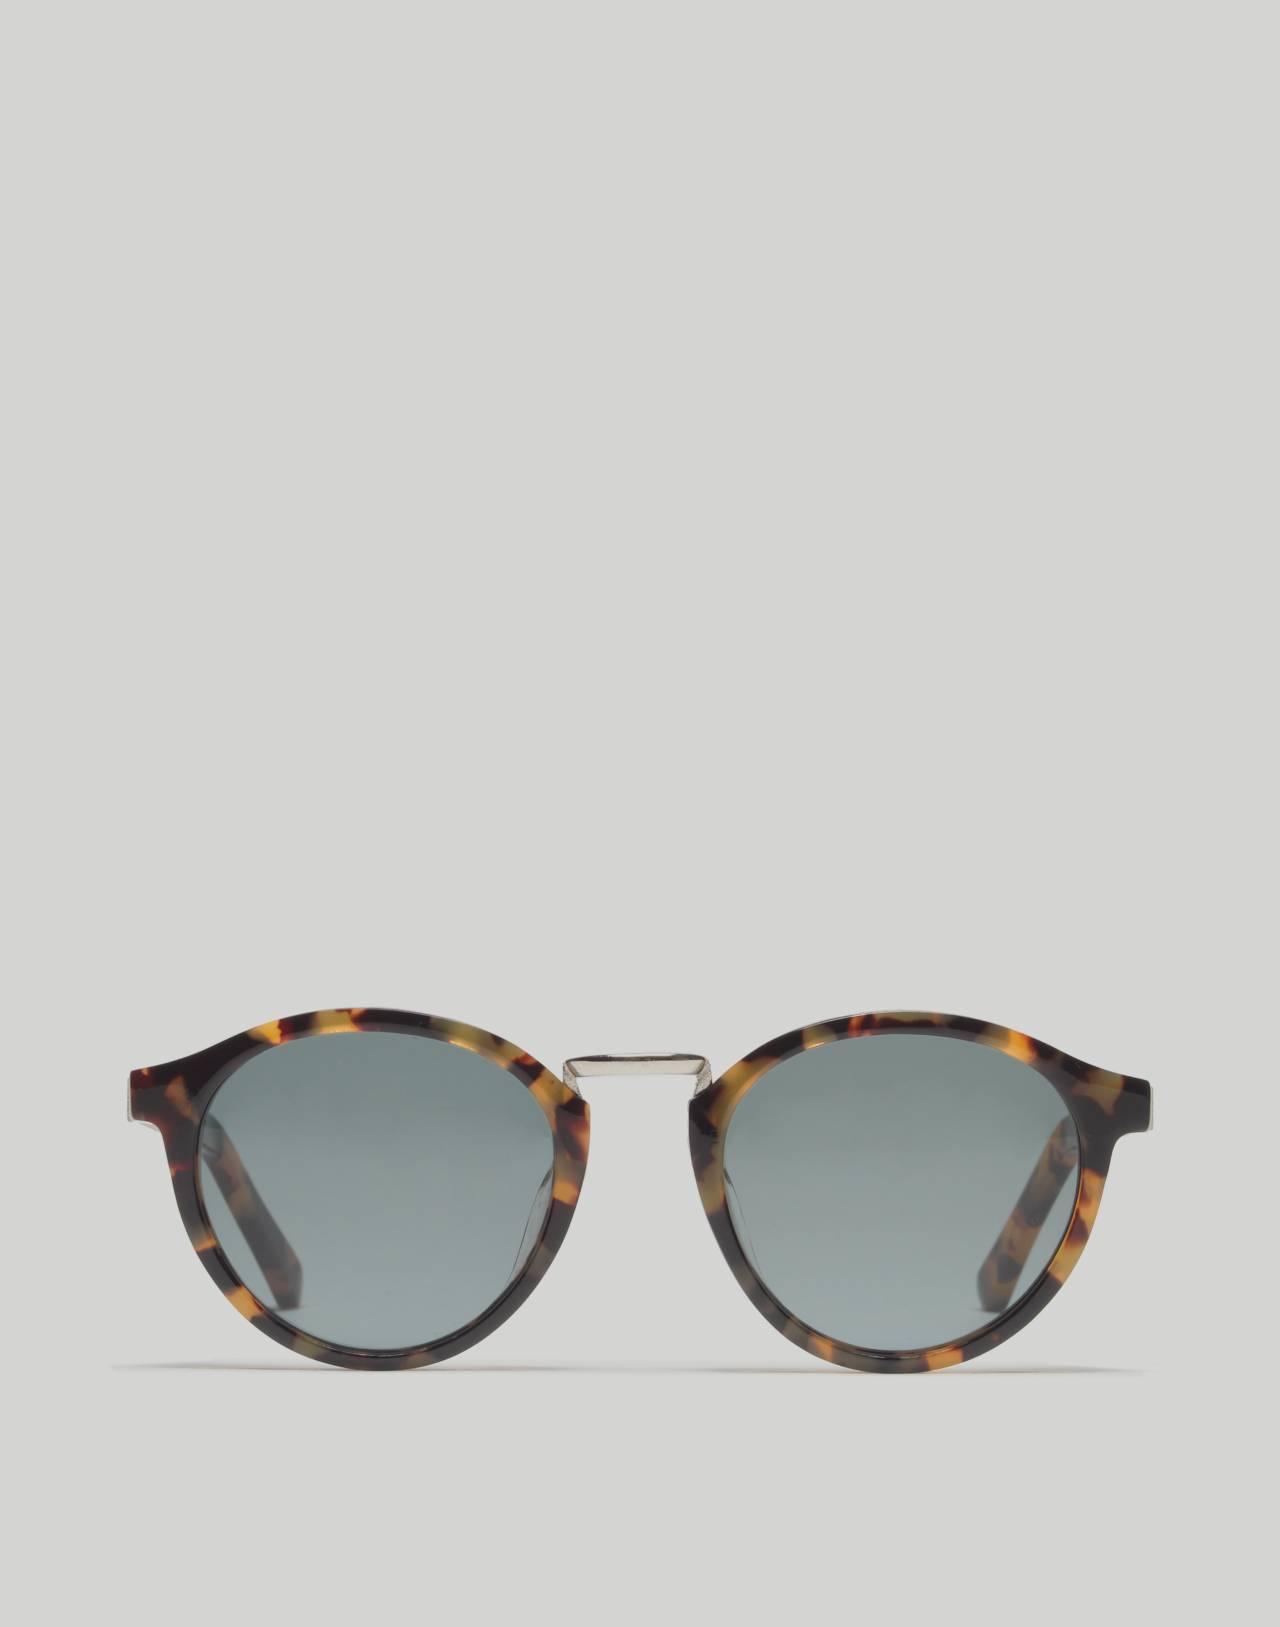 Indio Sunglasses in demi tort image 1